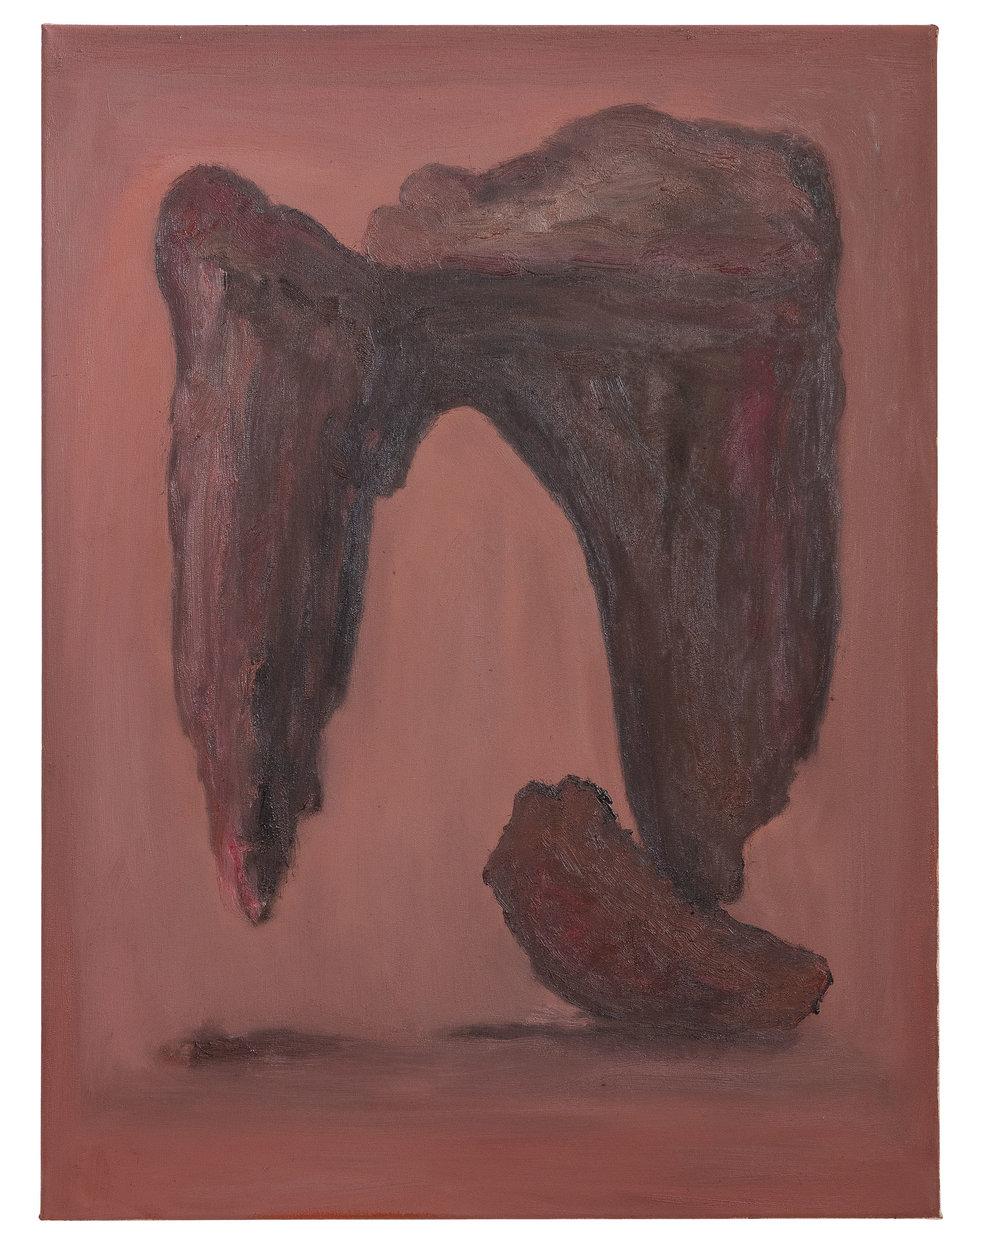 Veronika Hilger, untitled, 2018, oil on canvas